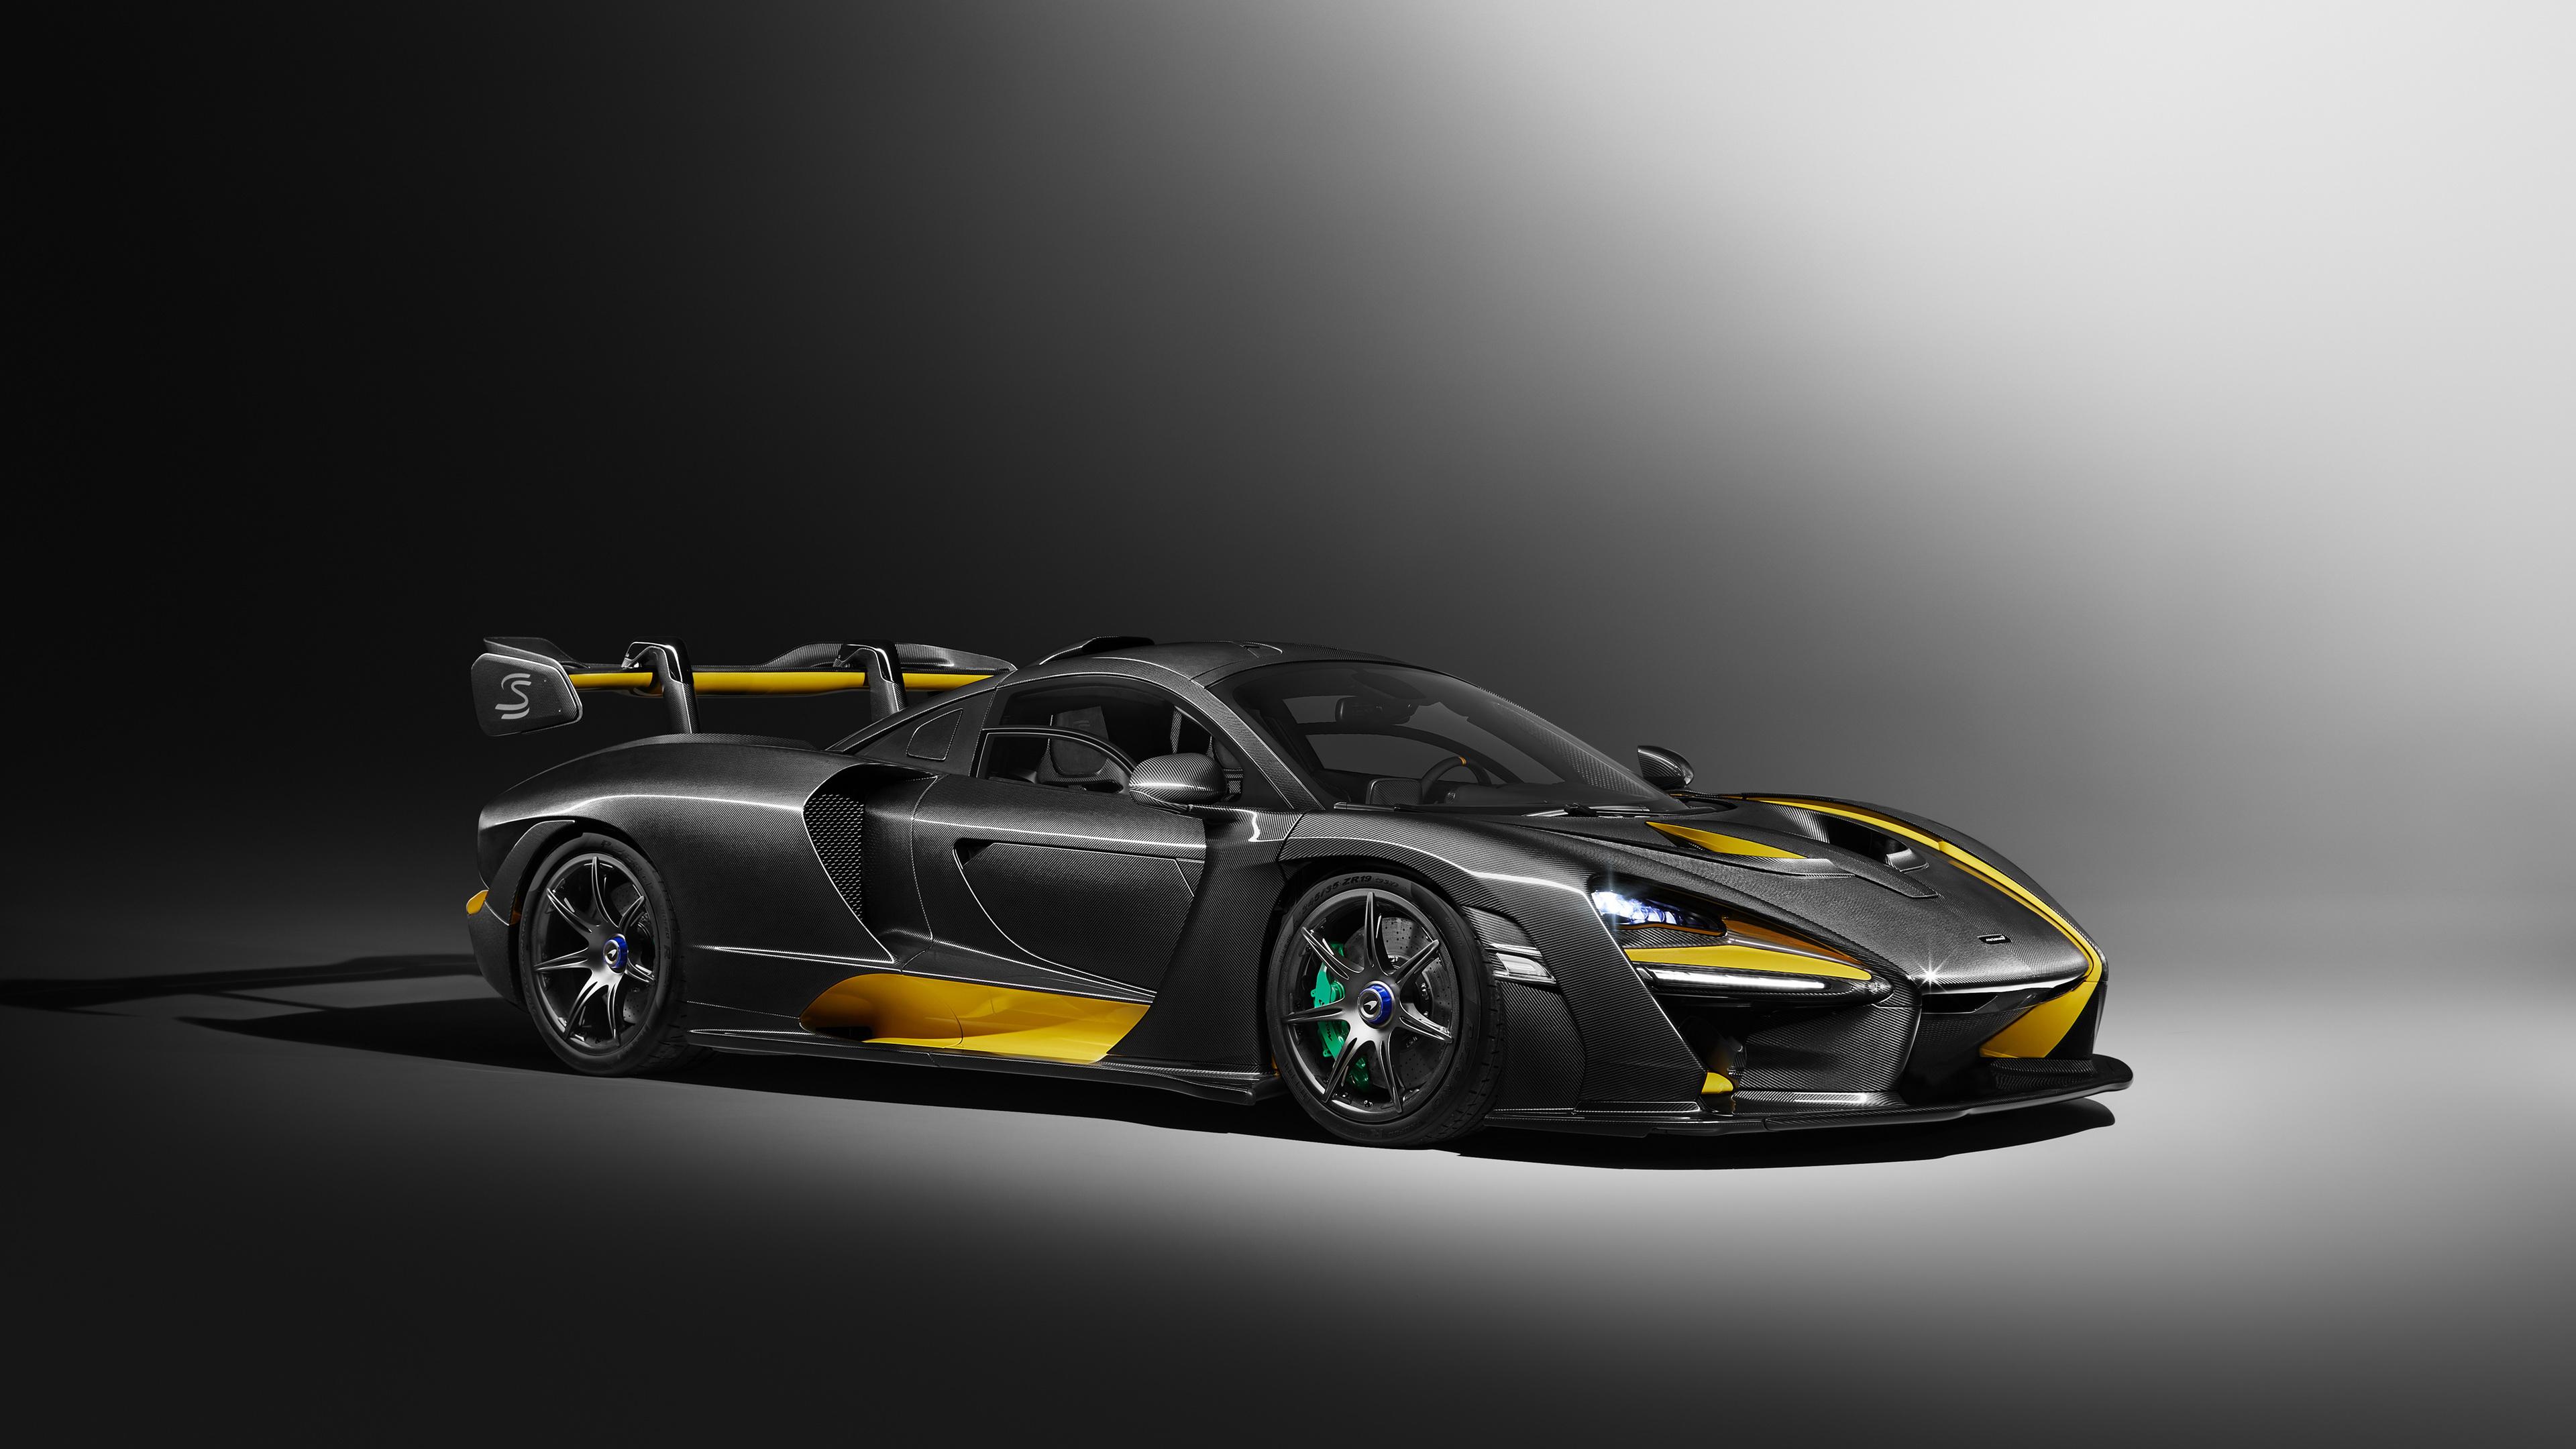 mclaren mso senna carbon theme 2018 1539110045 - McLaren MSO Senna Carbon Theme 2018 - mclaren wallpapers, mclaren senna wallpapers, hd-wallpapers, cars wallpapers, 4k-wallpapers, 2018 cars wallpapers